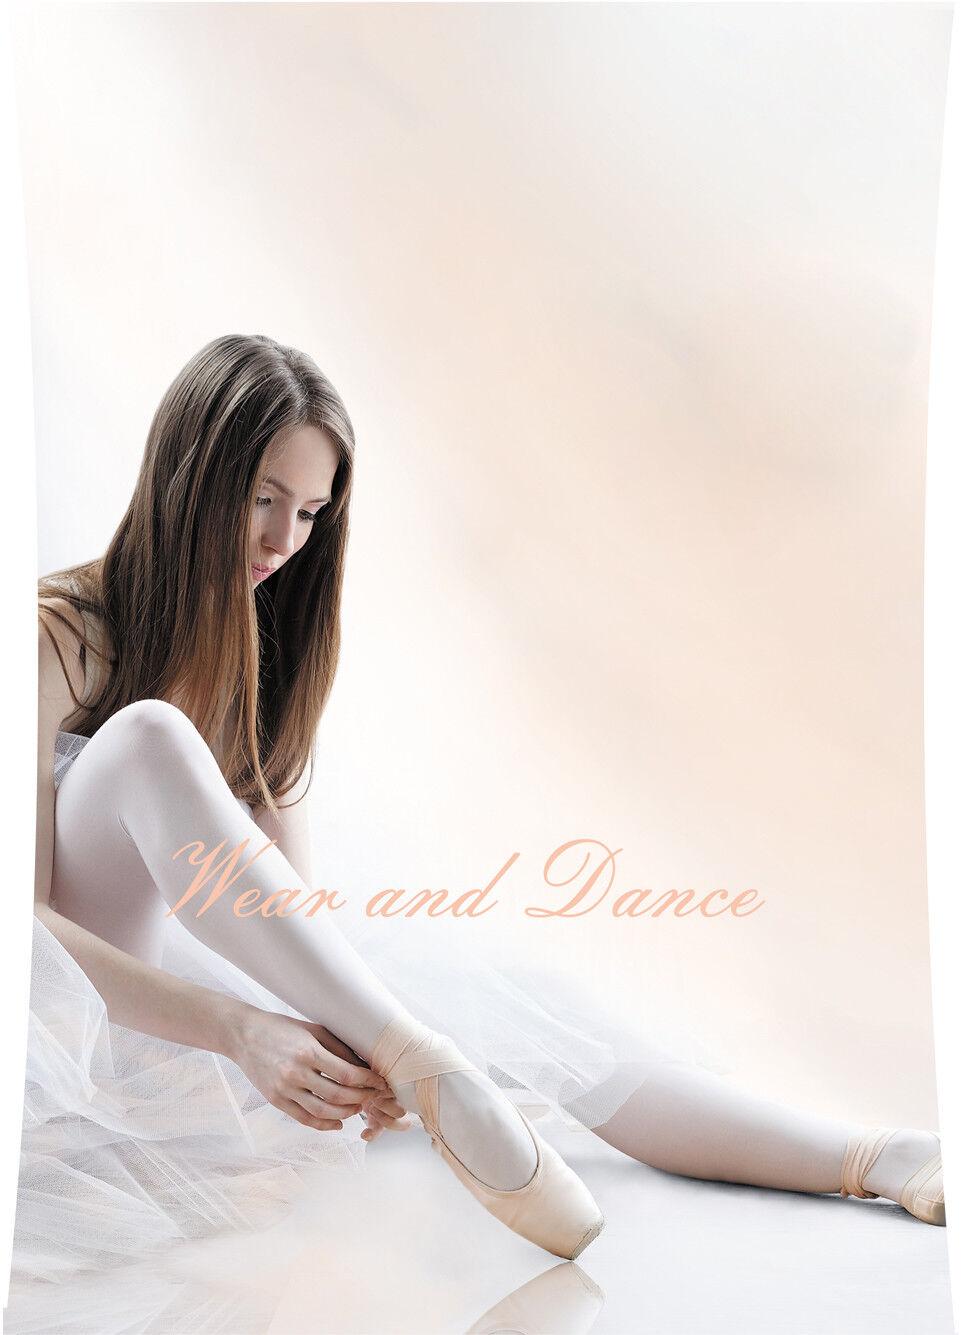 Pink Ballet Kids Tights 50 Den Isadora Dancing Wear Knittex